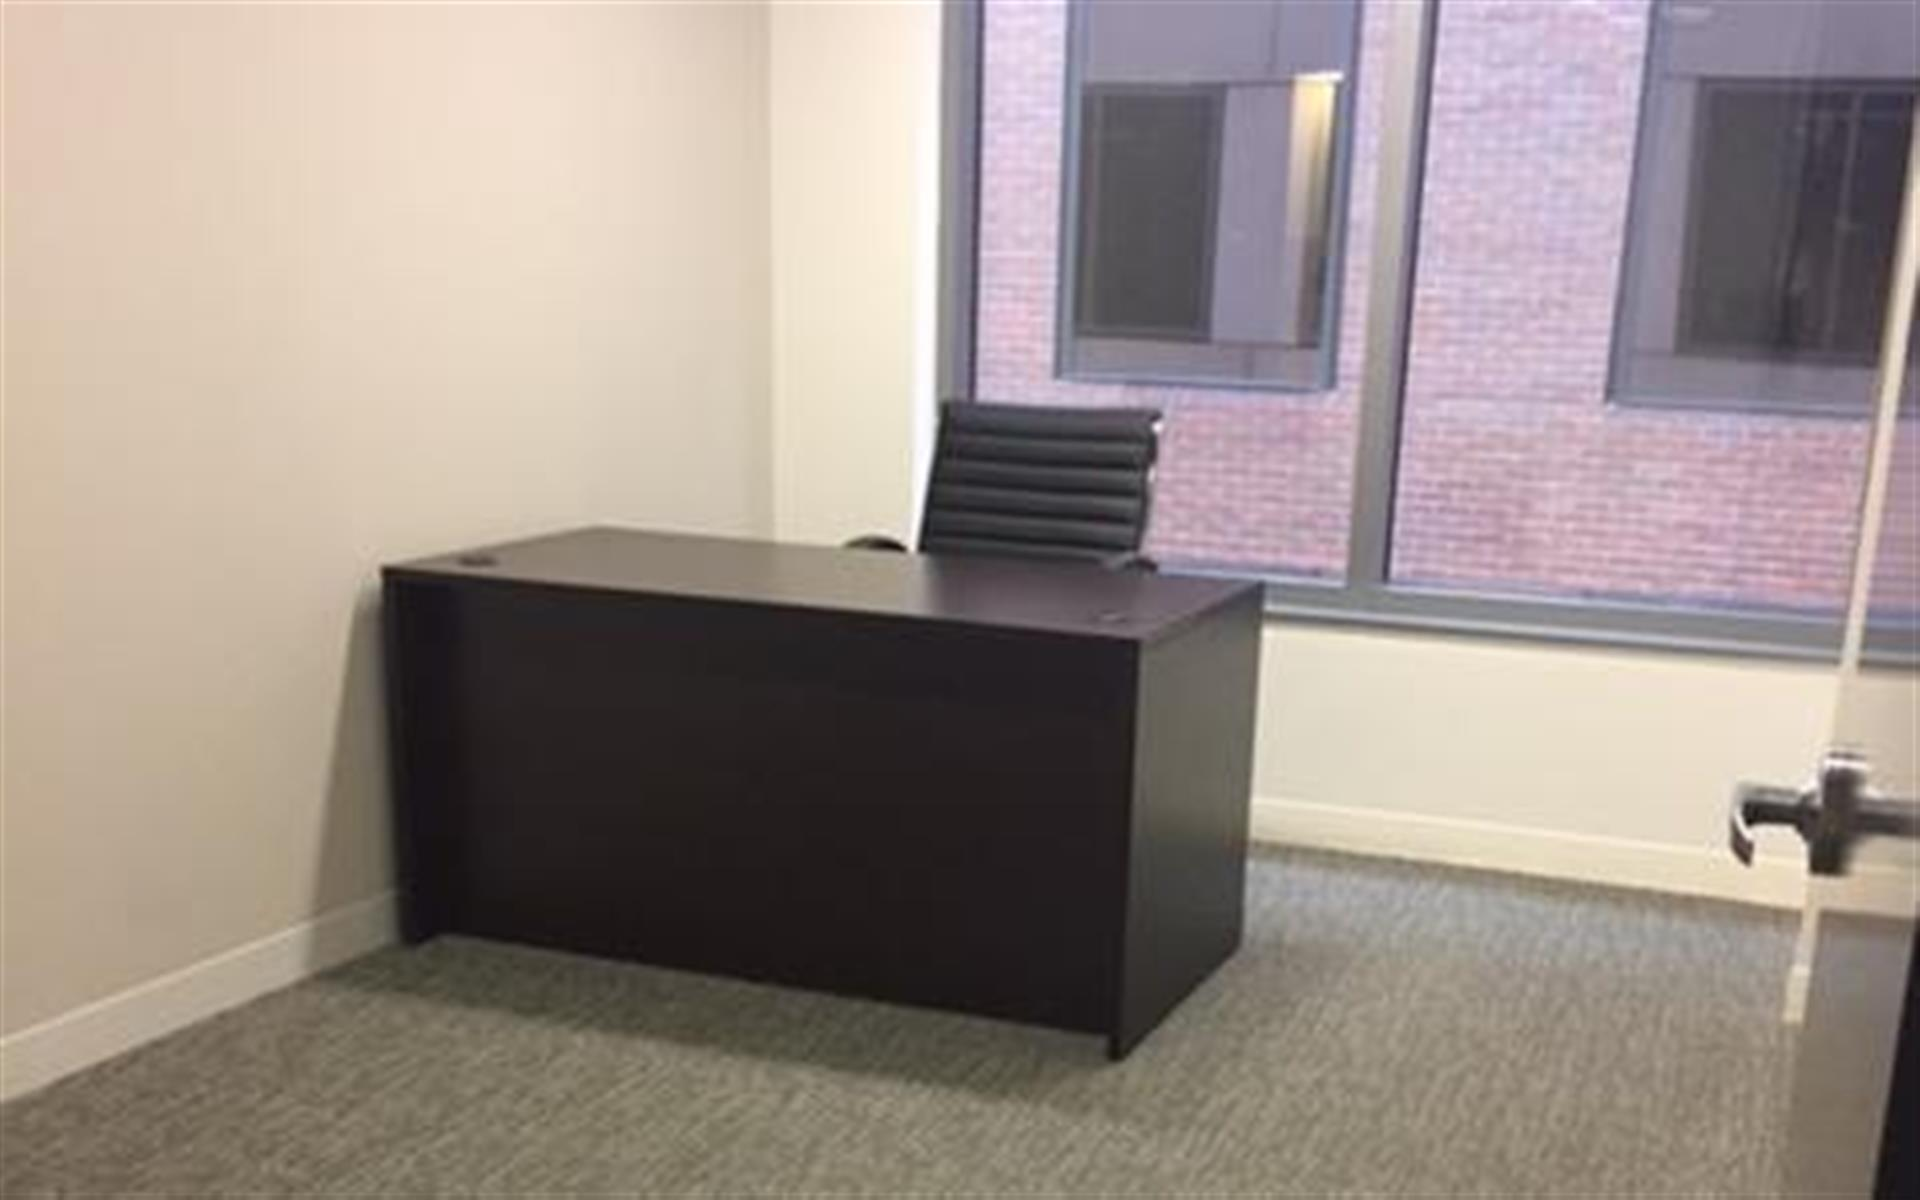 Centurion Center DC - Suite E3 - Windowed Office